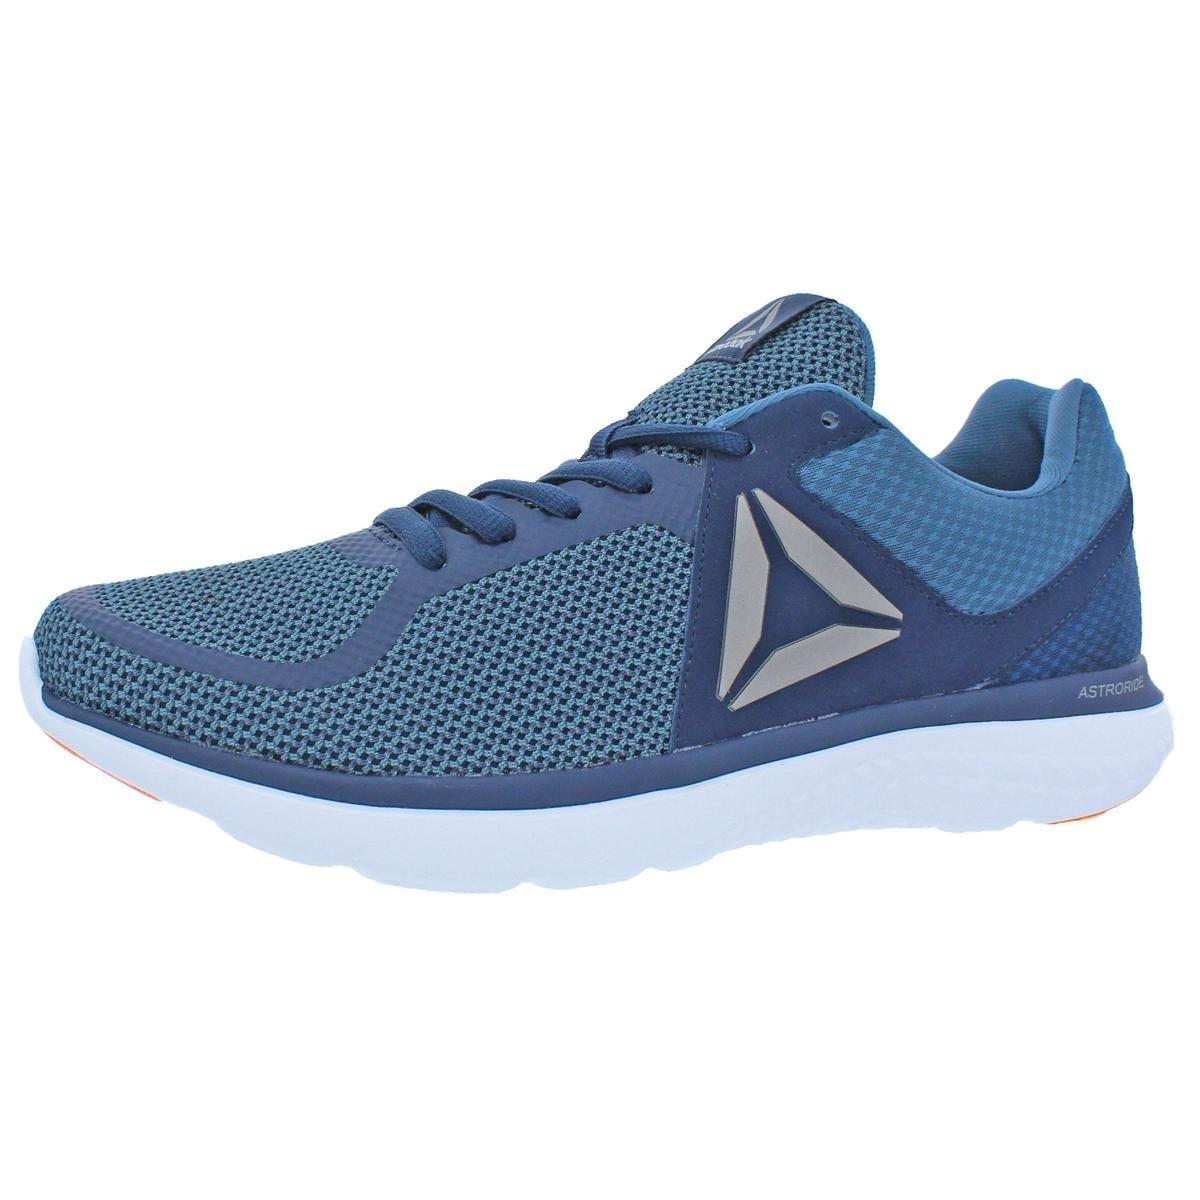 eb9afddb33f43 Reebok Mens Astroride Run MT Running Shoes MemoryTech Lightweight